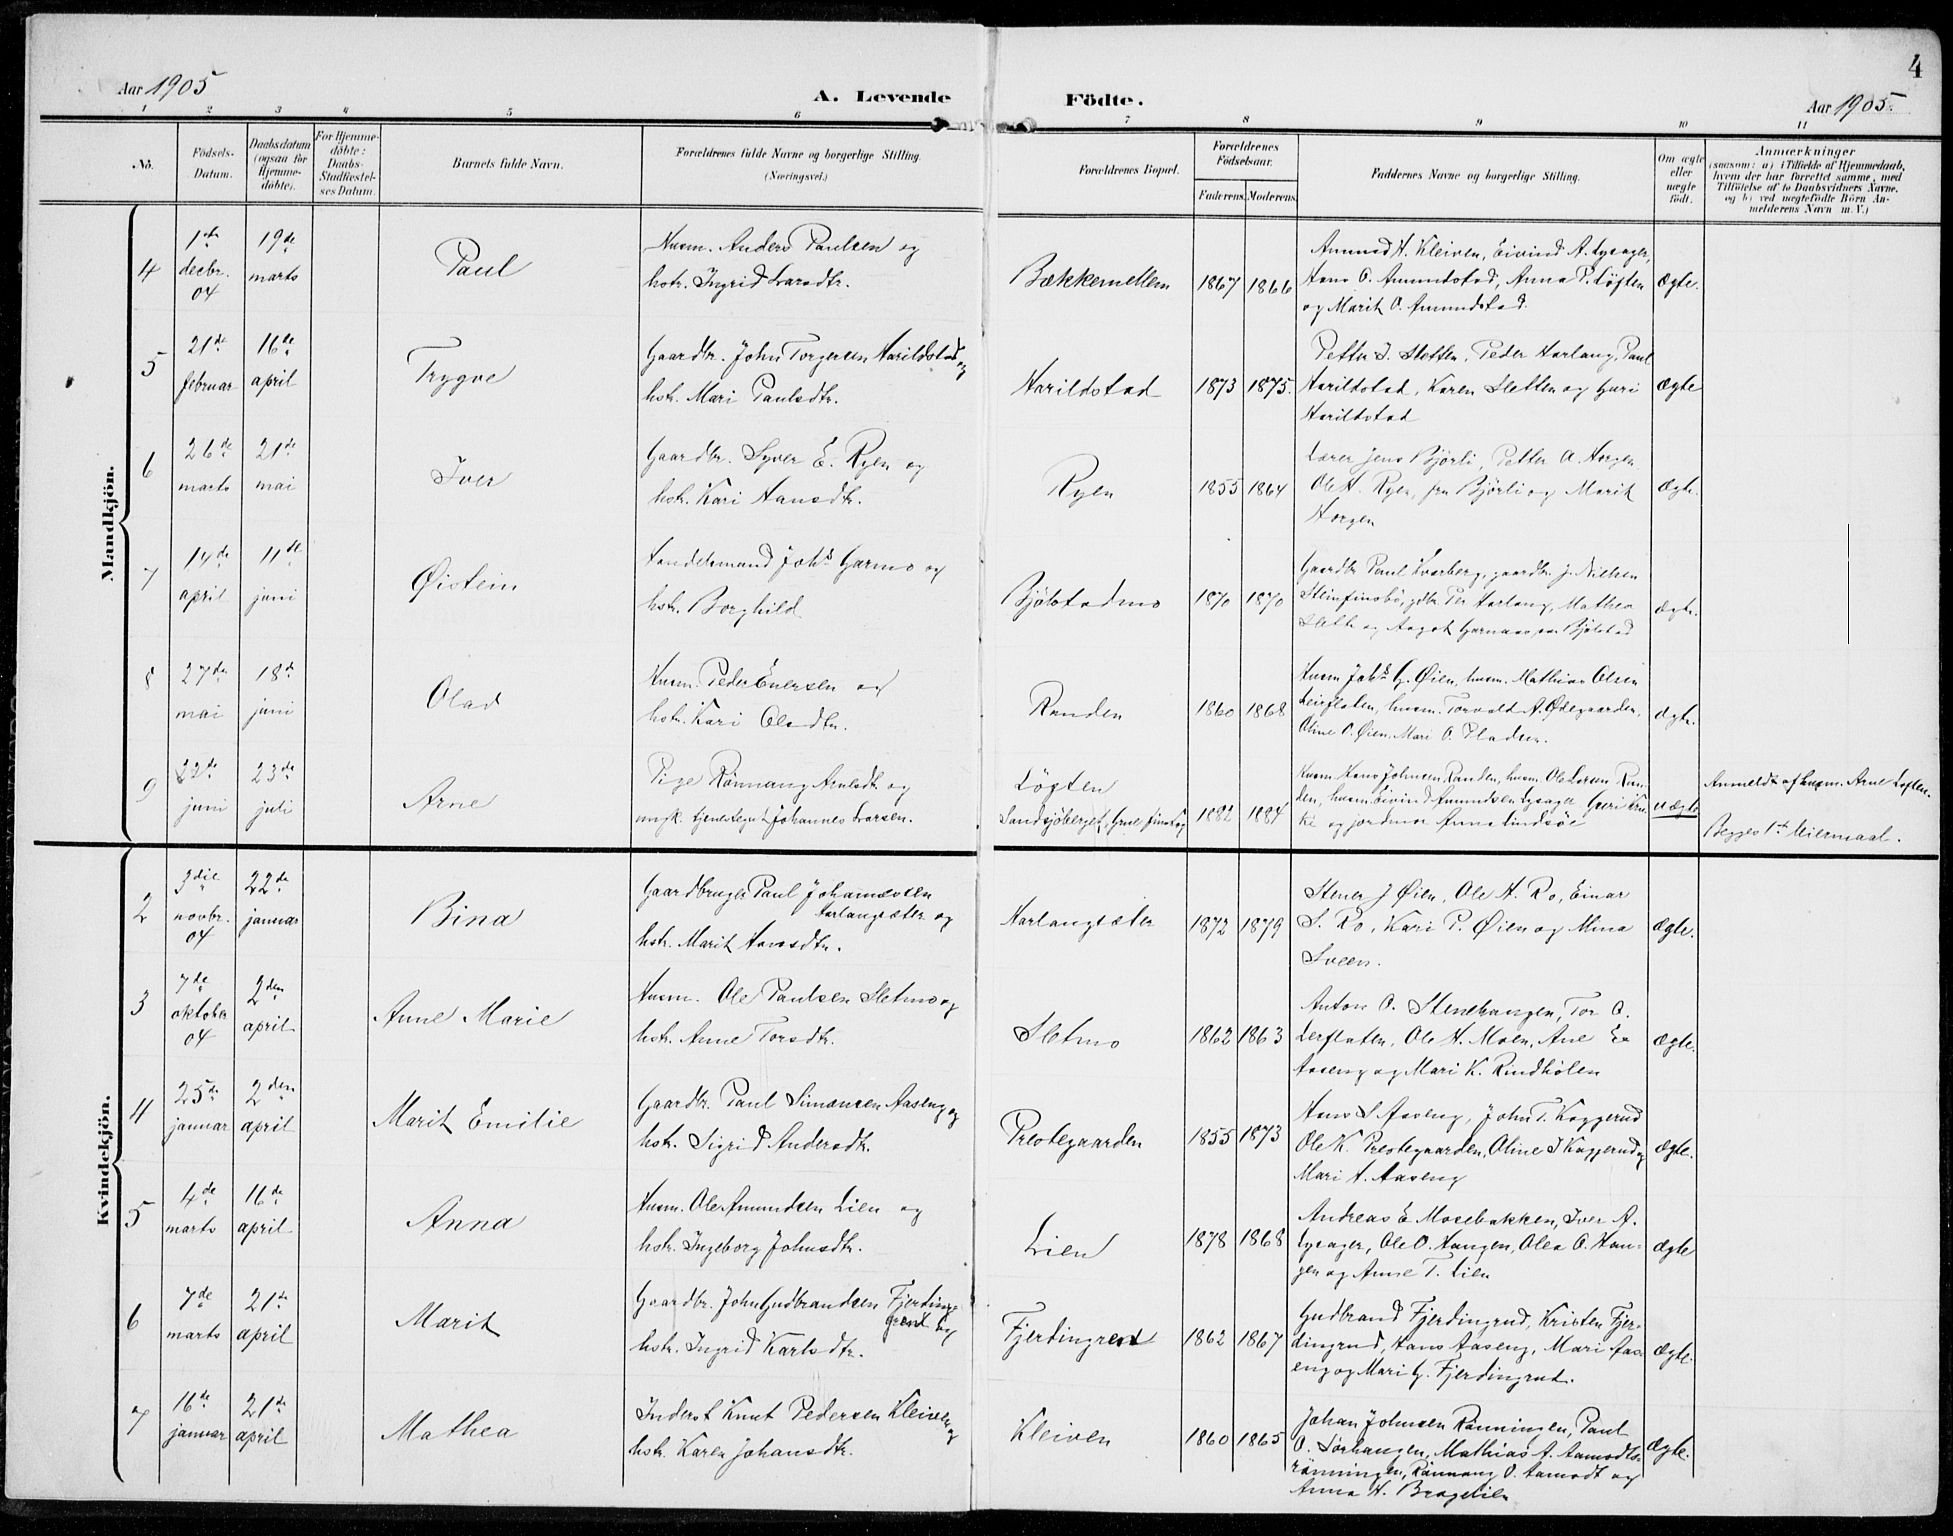 SAH, Sel prestekontor, Parish register (official) no. 1, 1905-1922, p. 4